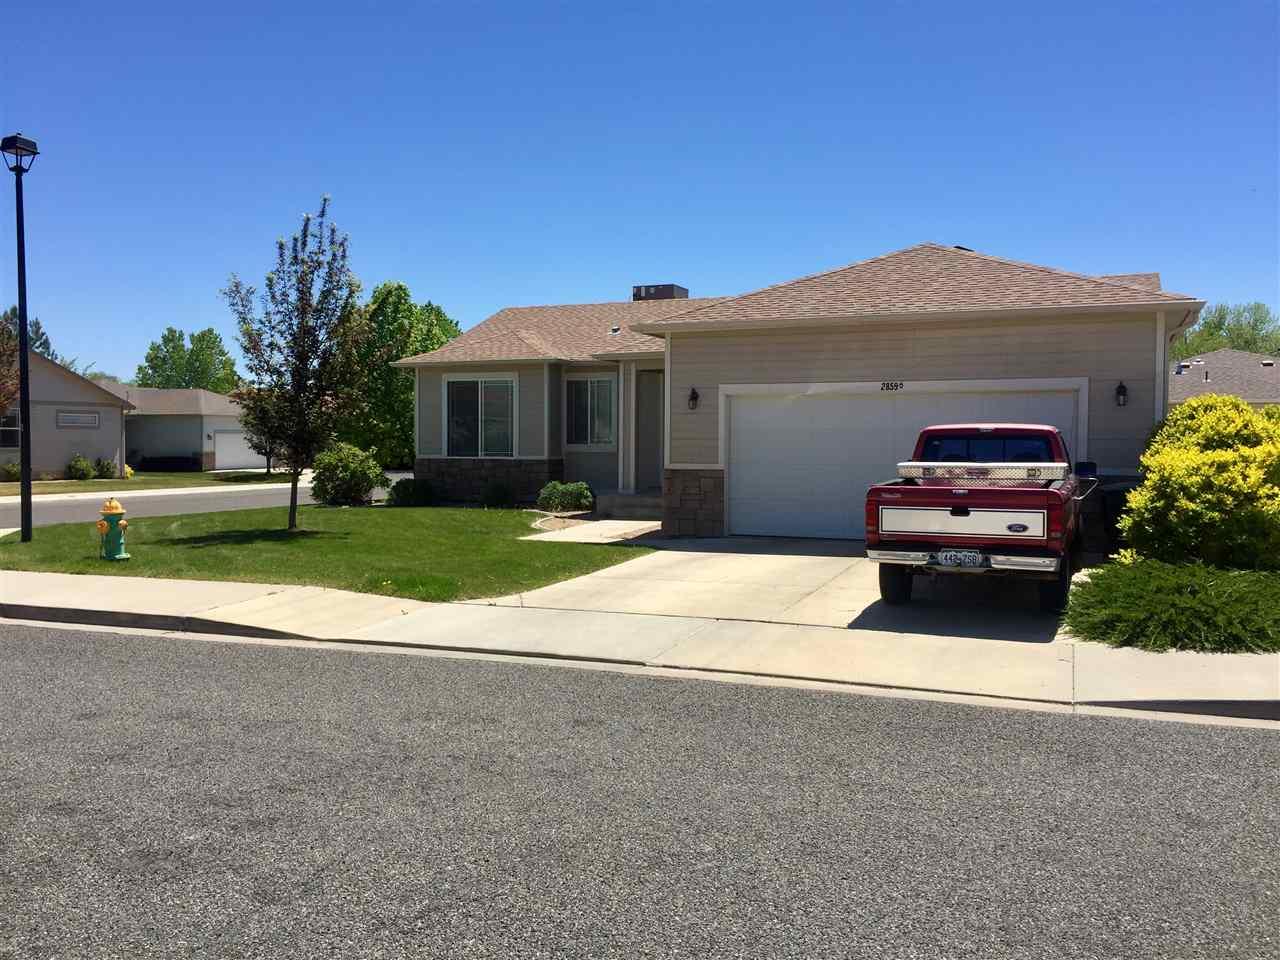 2859 1/2 Presley Avenue, Grand Junction, CO 81501